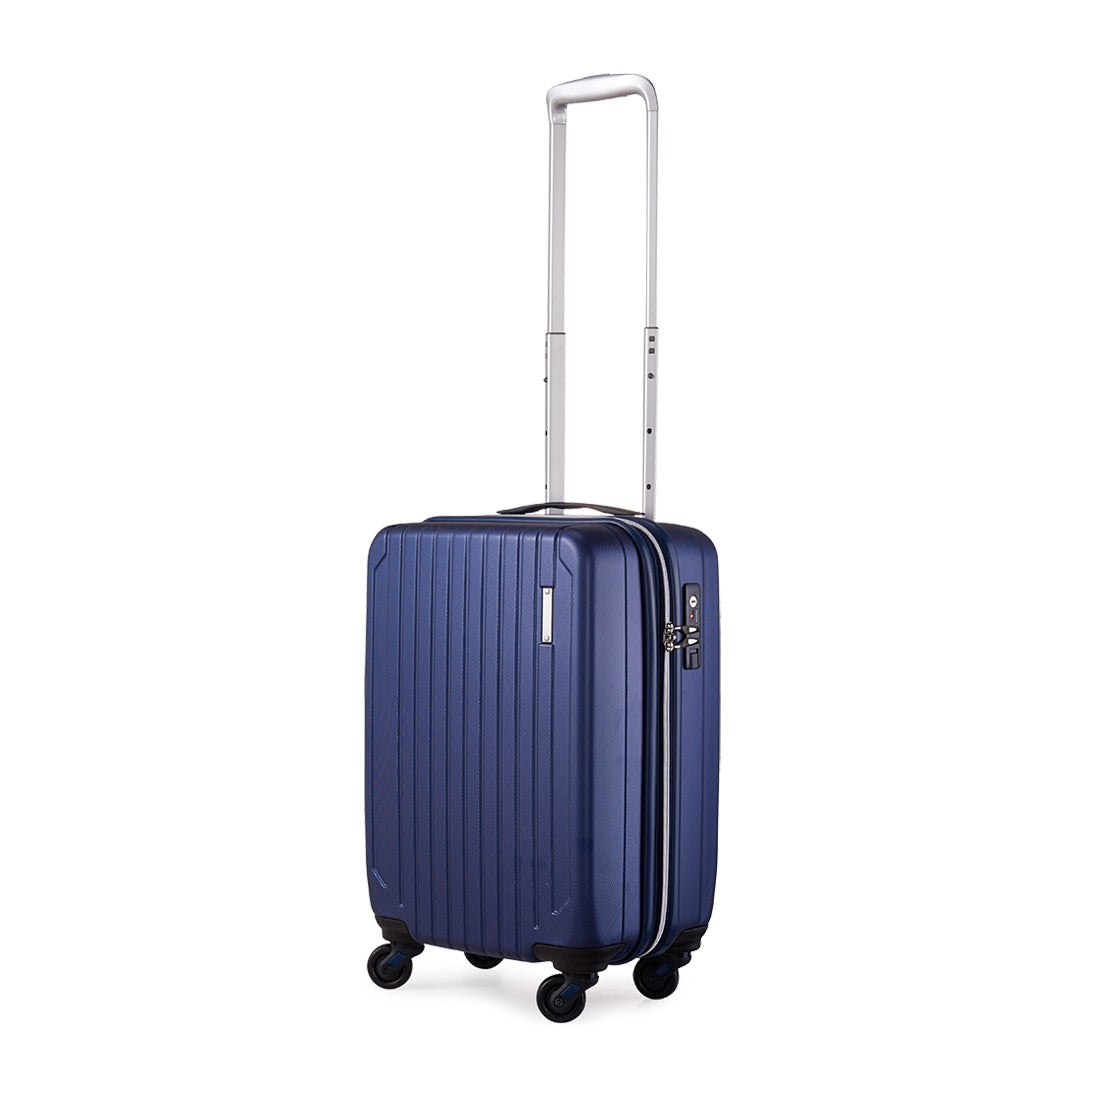 【SAC'S BAR】サンコー SUNCO スーツケース SAAS-46 46cm エンボスネイビー メンズ